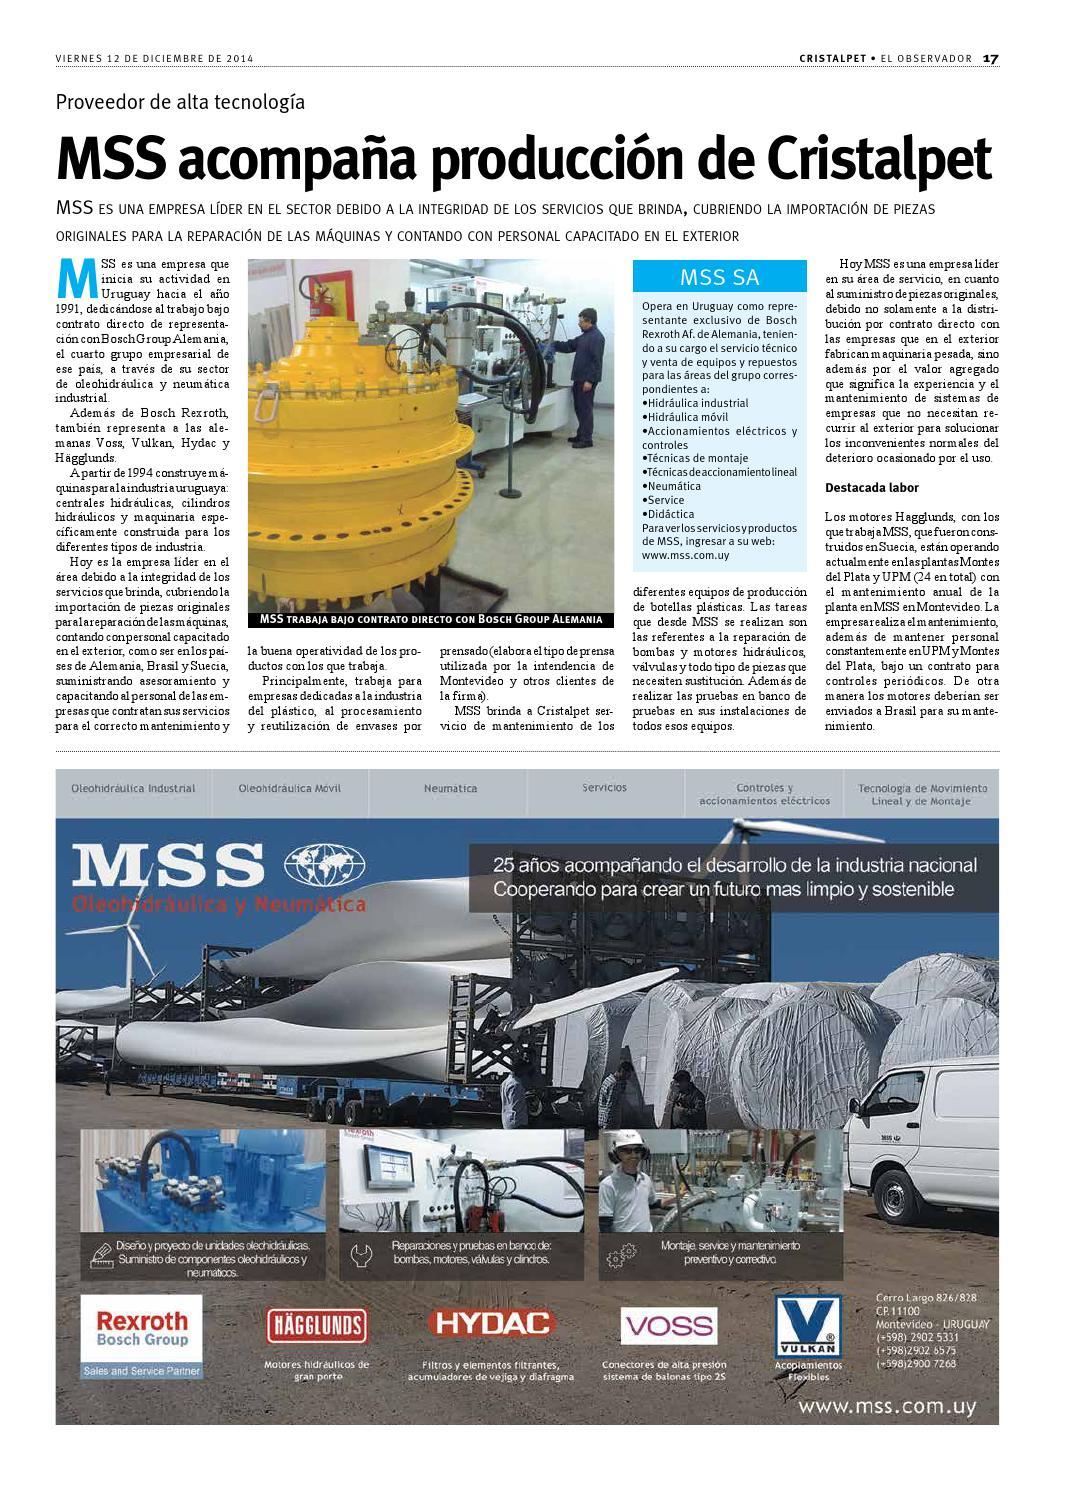 505eab73b Suplemento Cristalpet 2014 by Portal El Observador - issuu